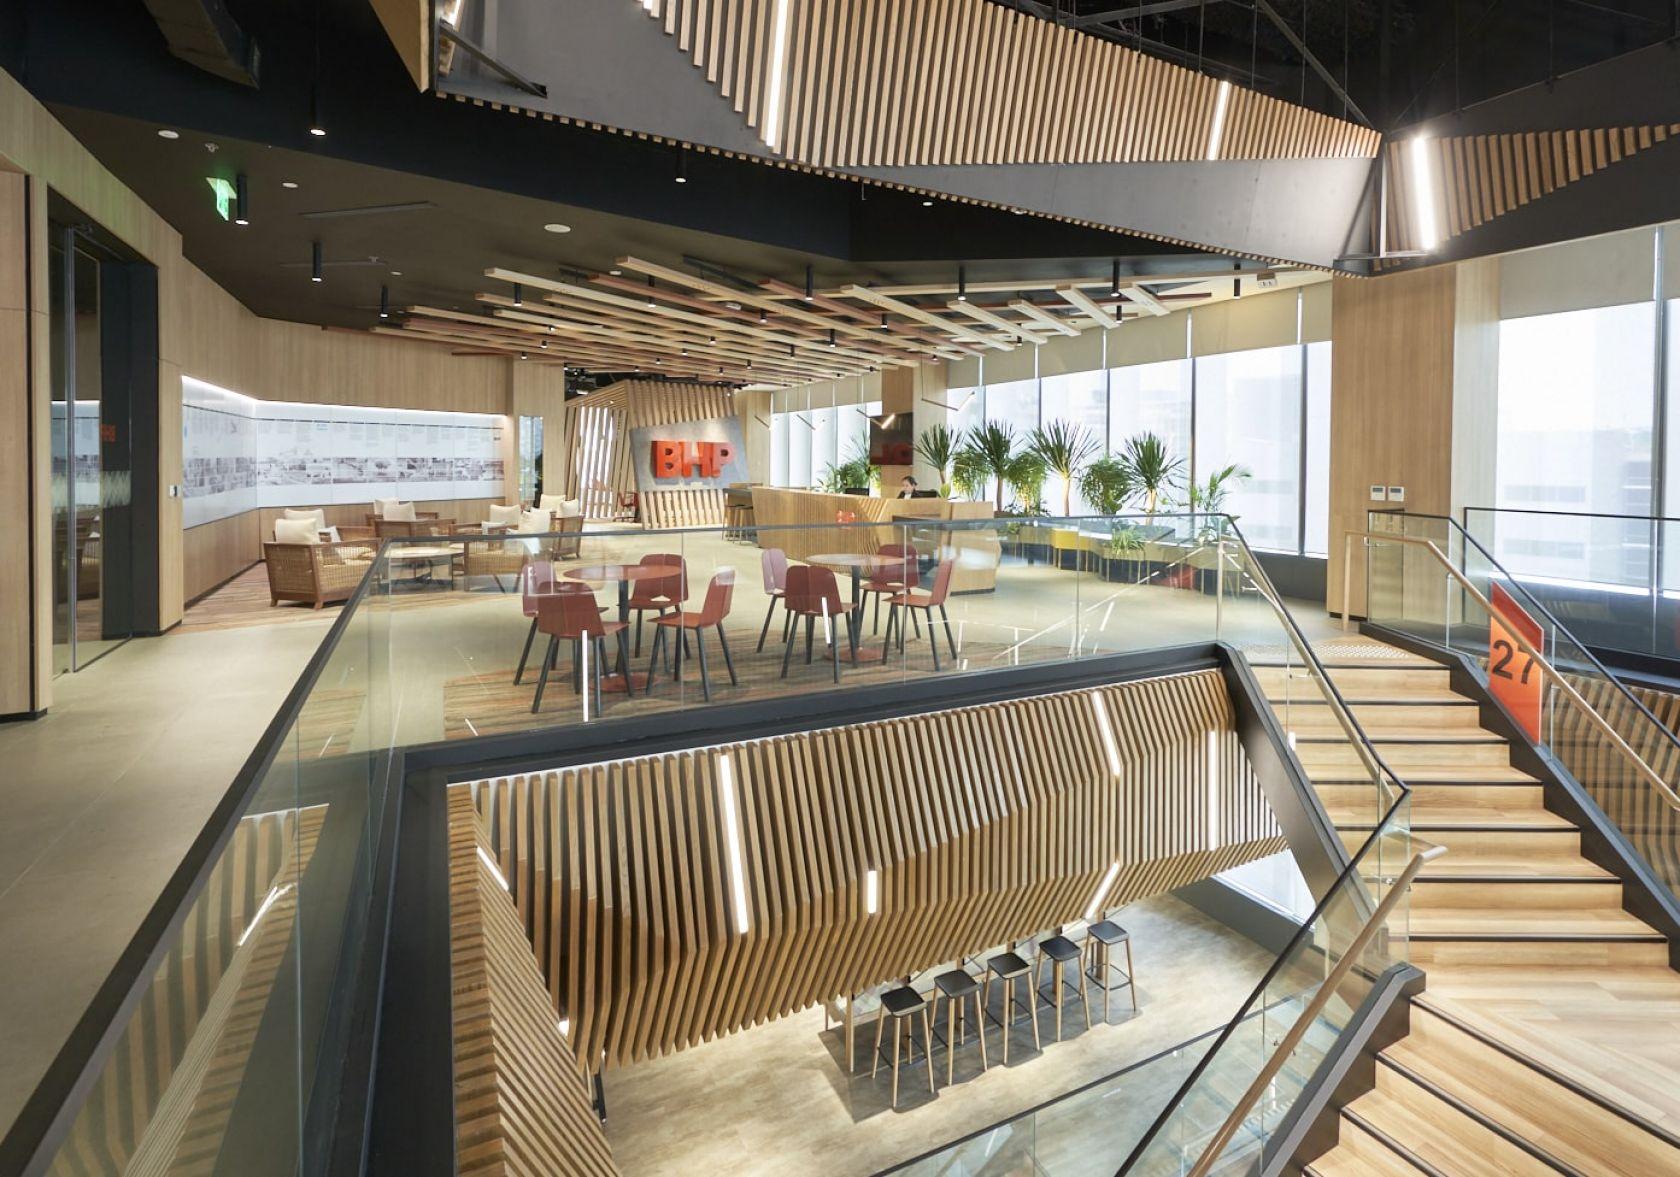 BHP Manila's Leesman Plus rated workplace   Equiem tenant experience software